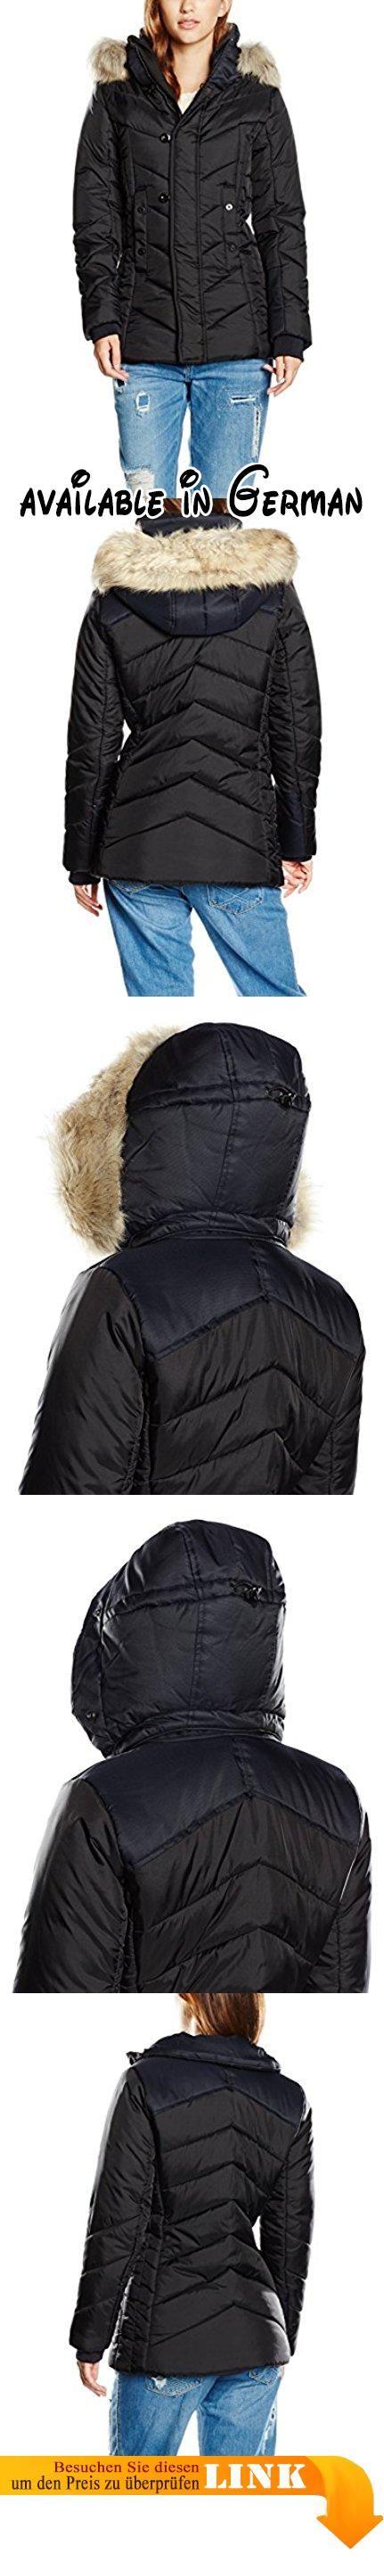 Hdd Alaska Raw Jacke G Fur Star WmnSchwarz Damen Coat LMGqVzUSp